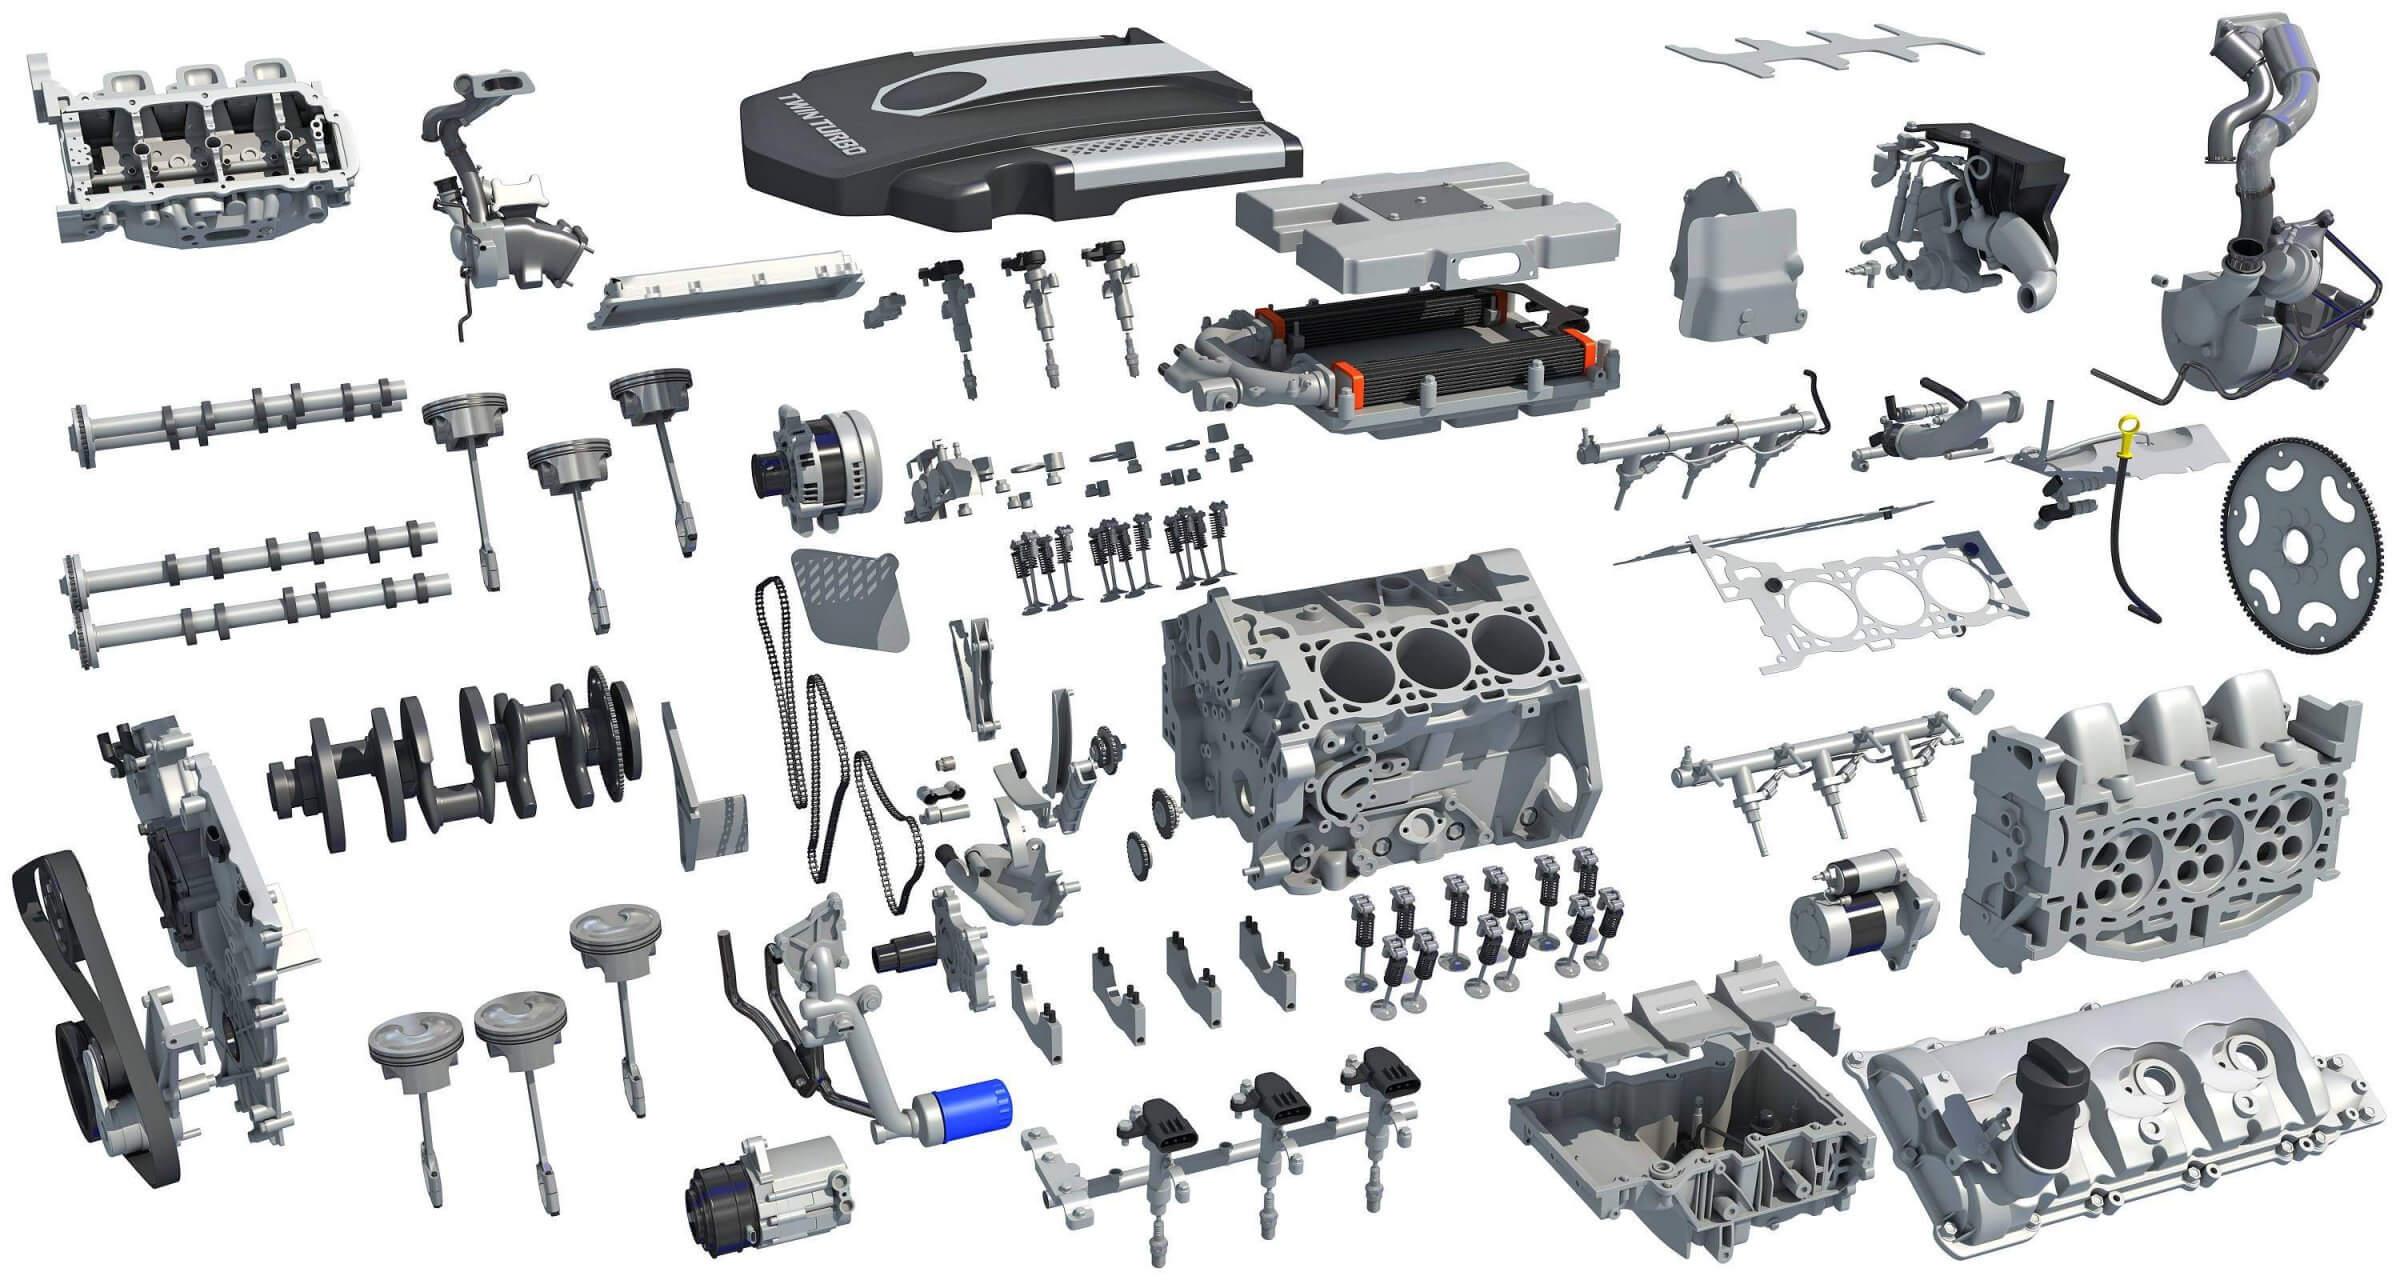 Full Twin Turbo V6 Car Engine 3d Model